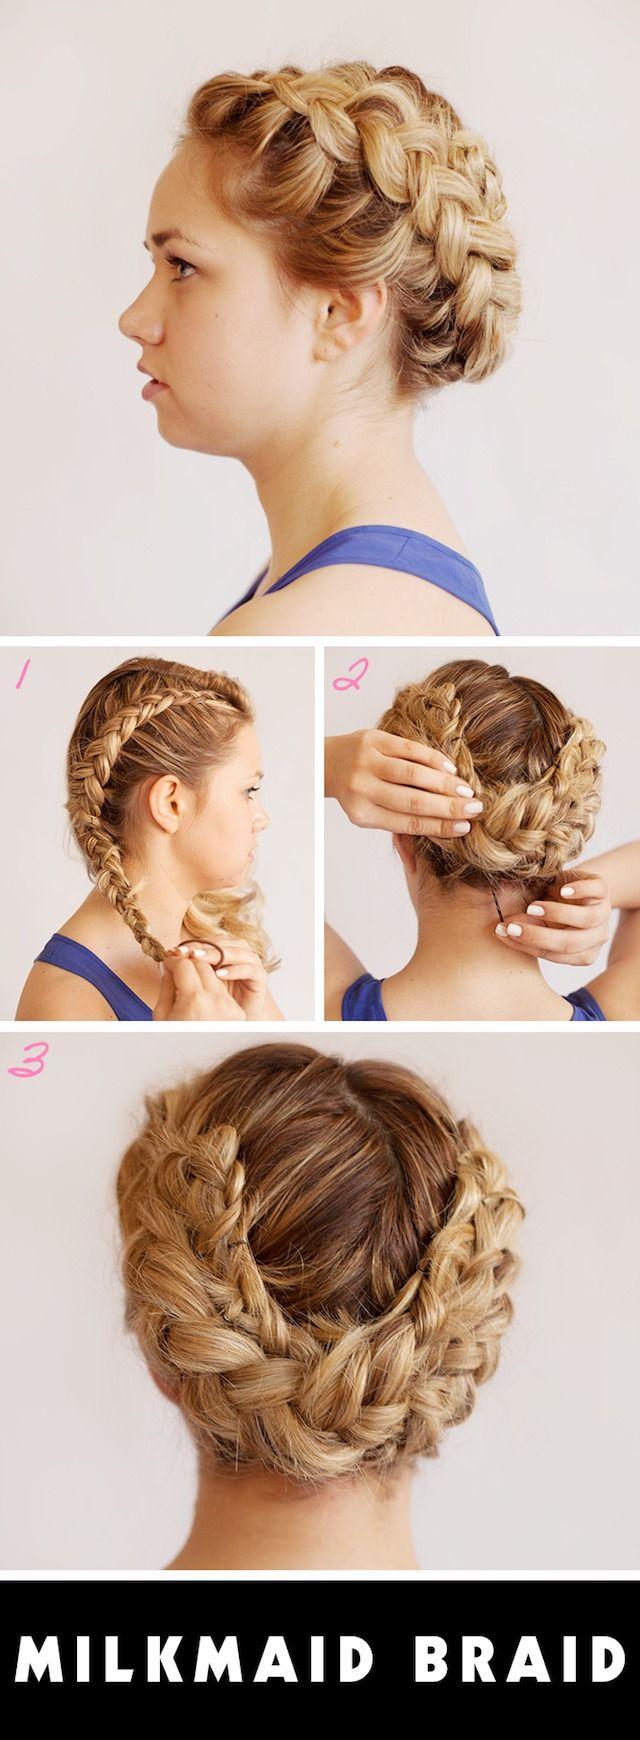 milkmaid braid how to